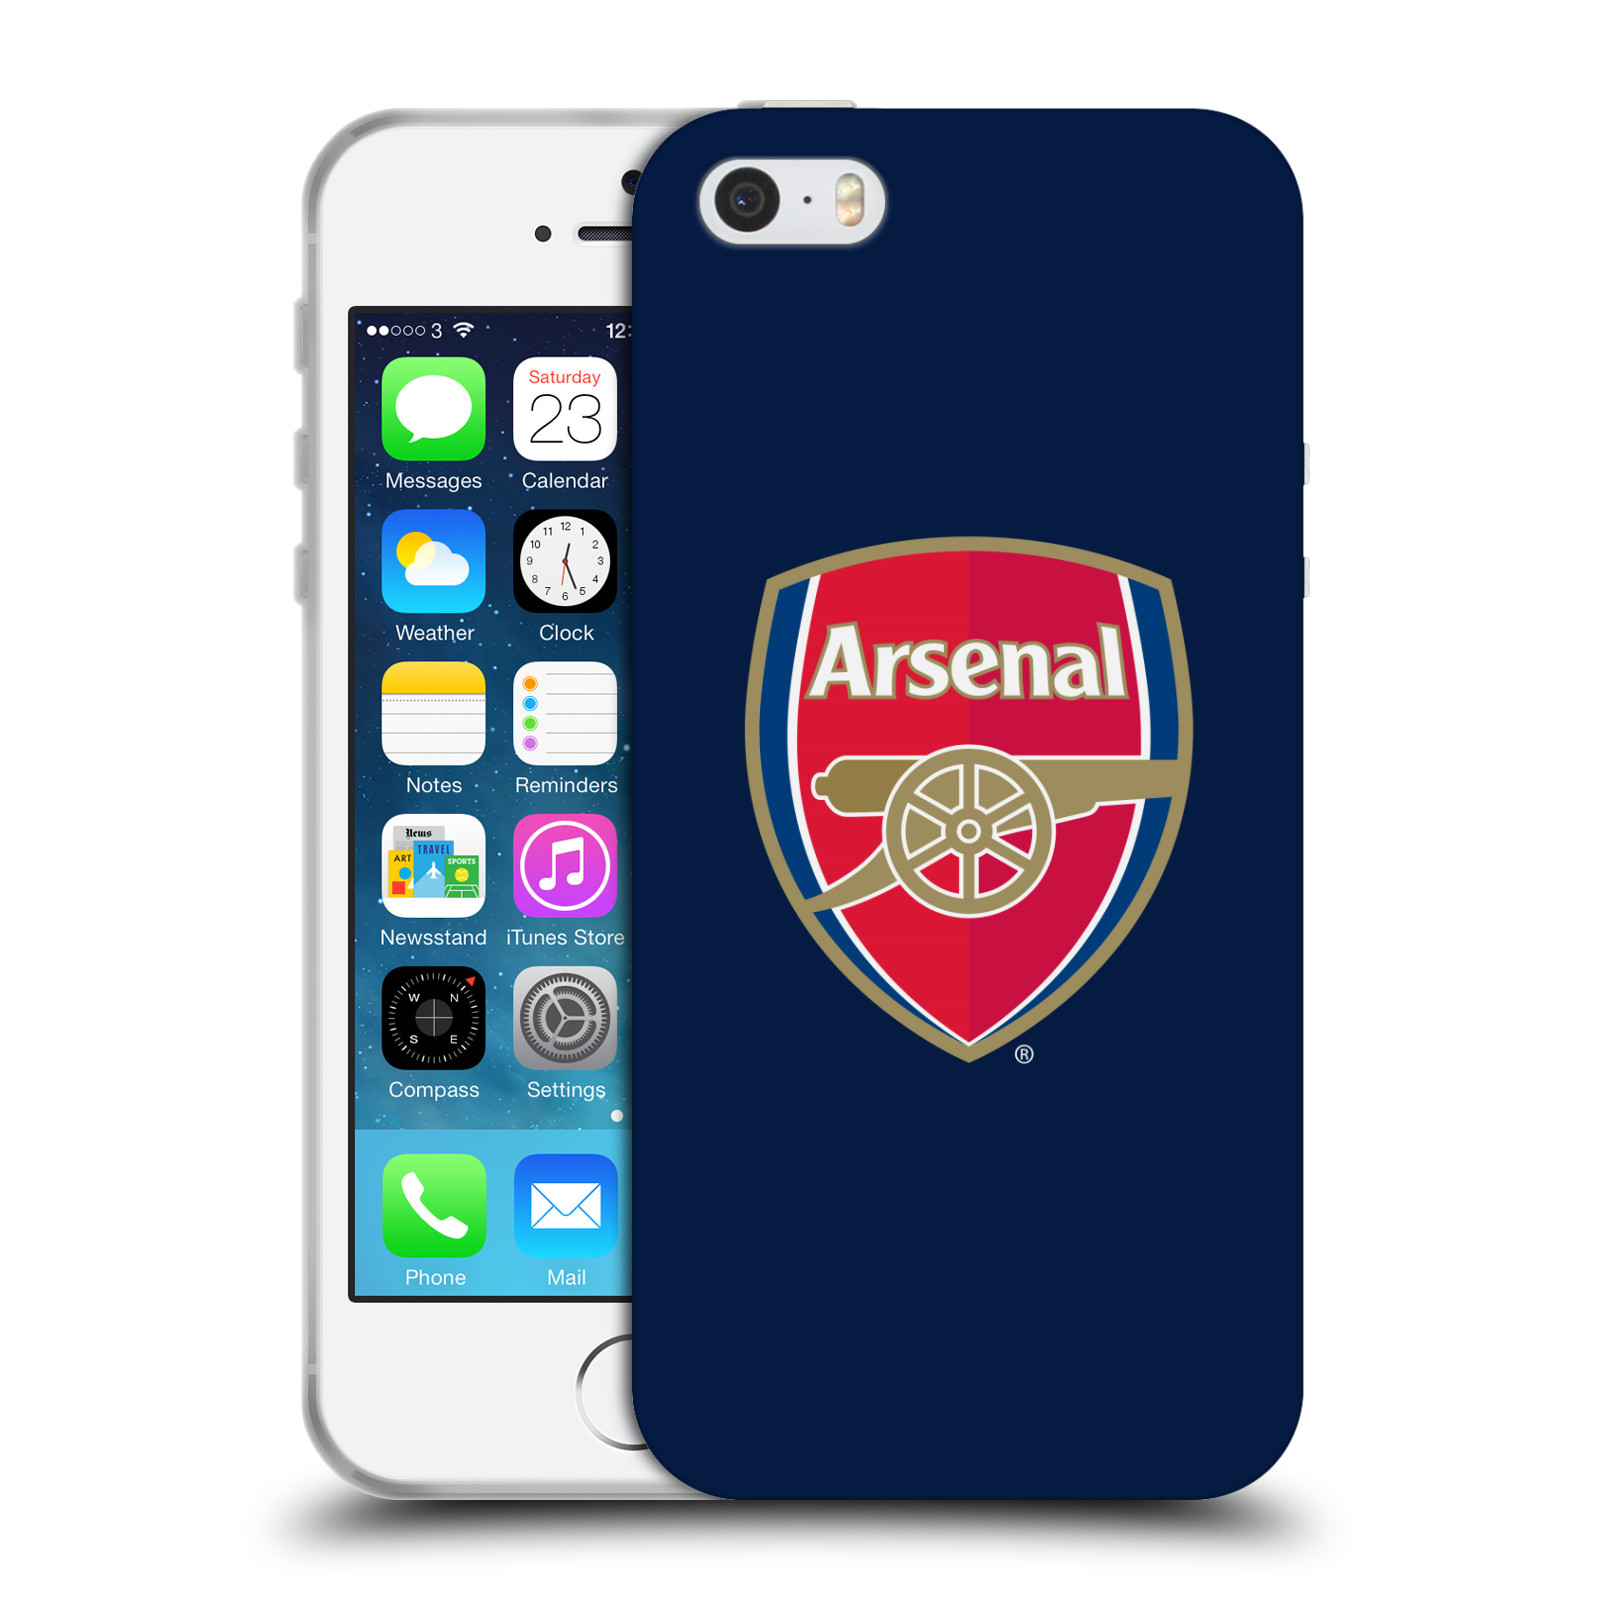 HEAD CASE silikonový obal na mobil Apple Iphone 5/5S Fotbalový klub Arsenal znak barevný modré pozadí